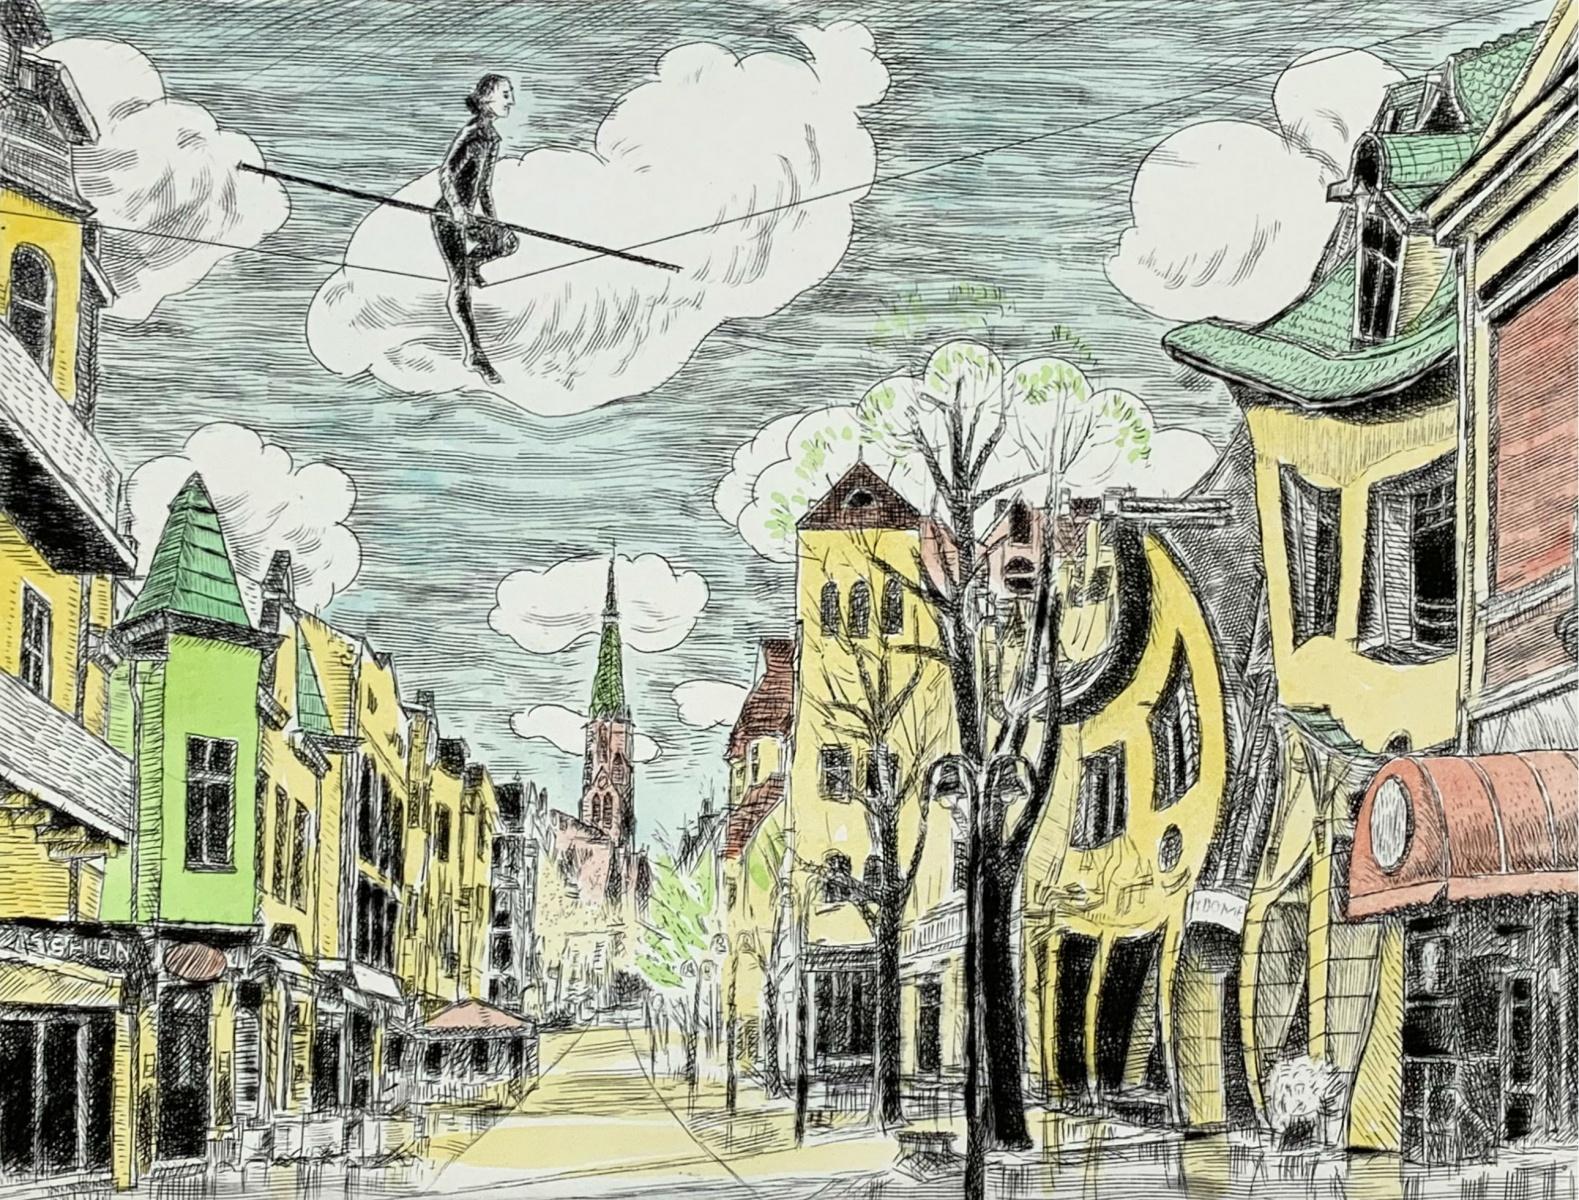 Sopot city, Monte Cassino street - Figurative drypoint print & watercolor